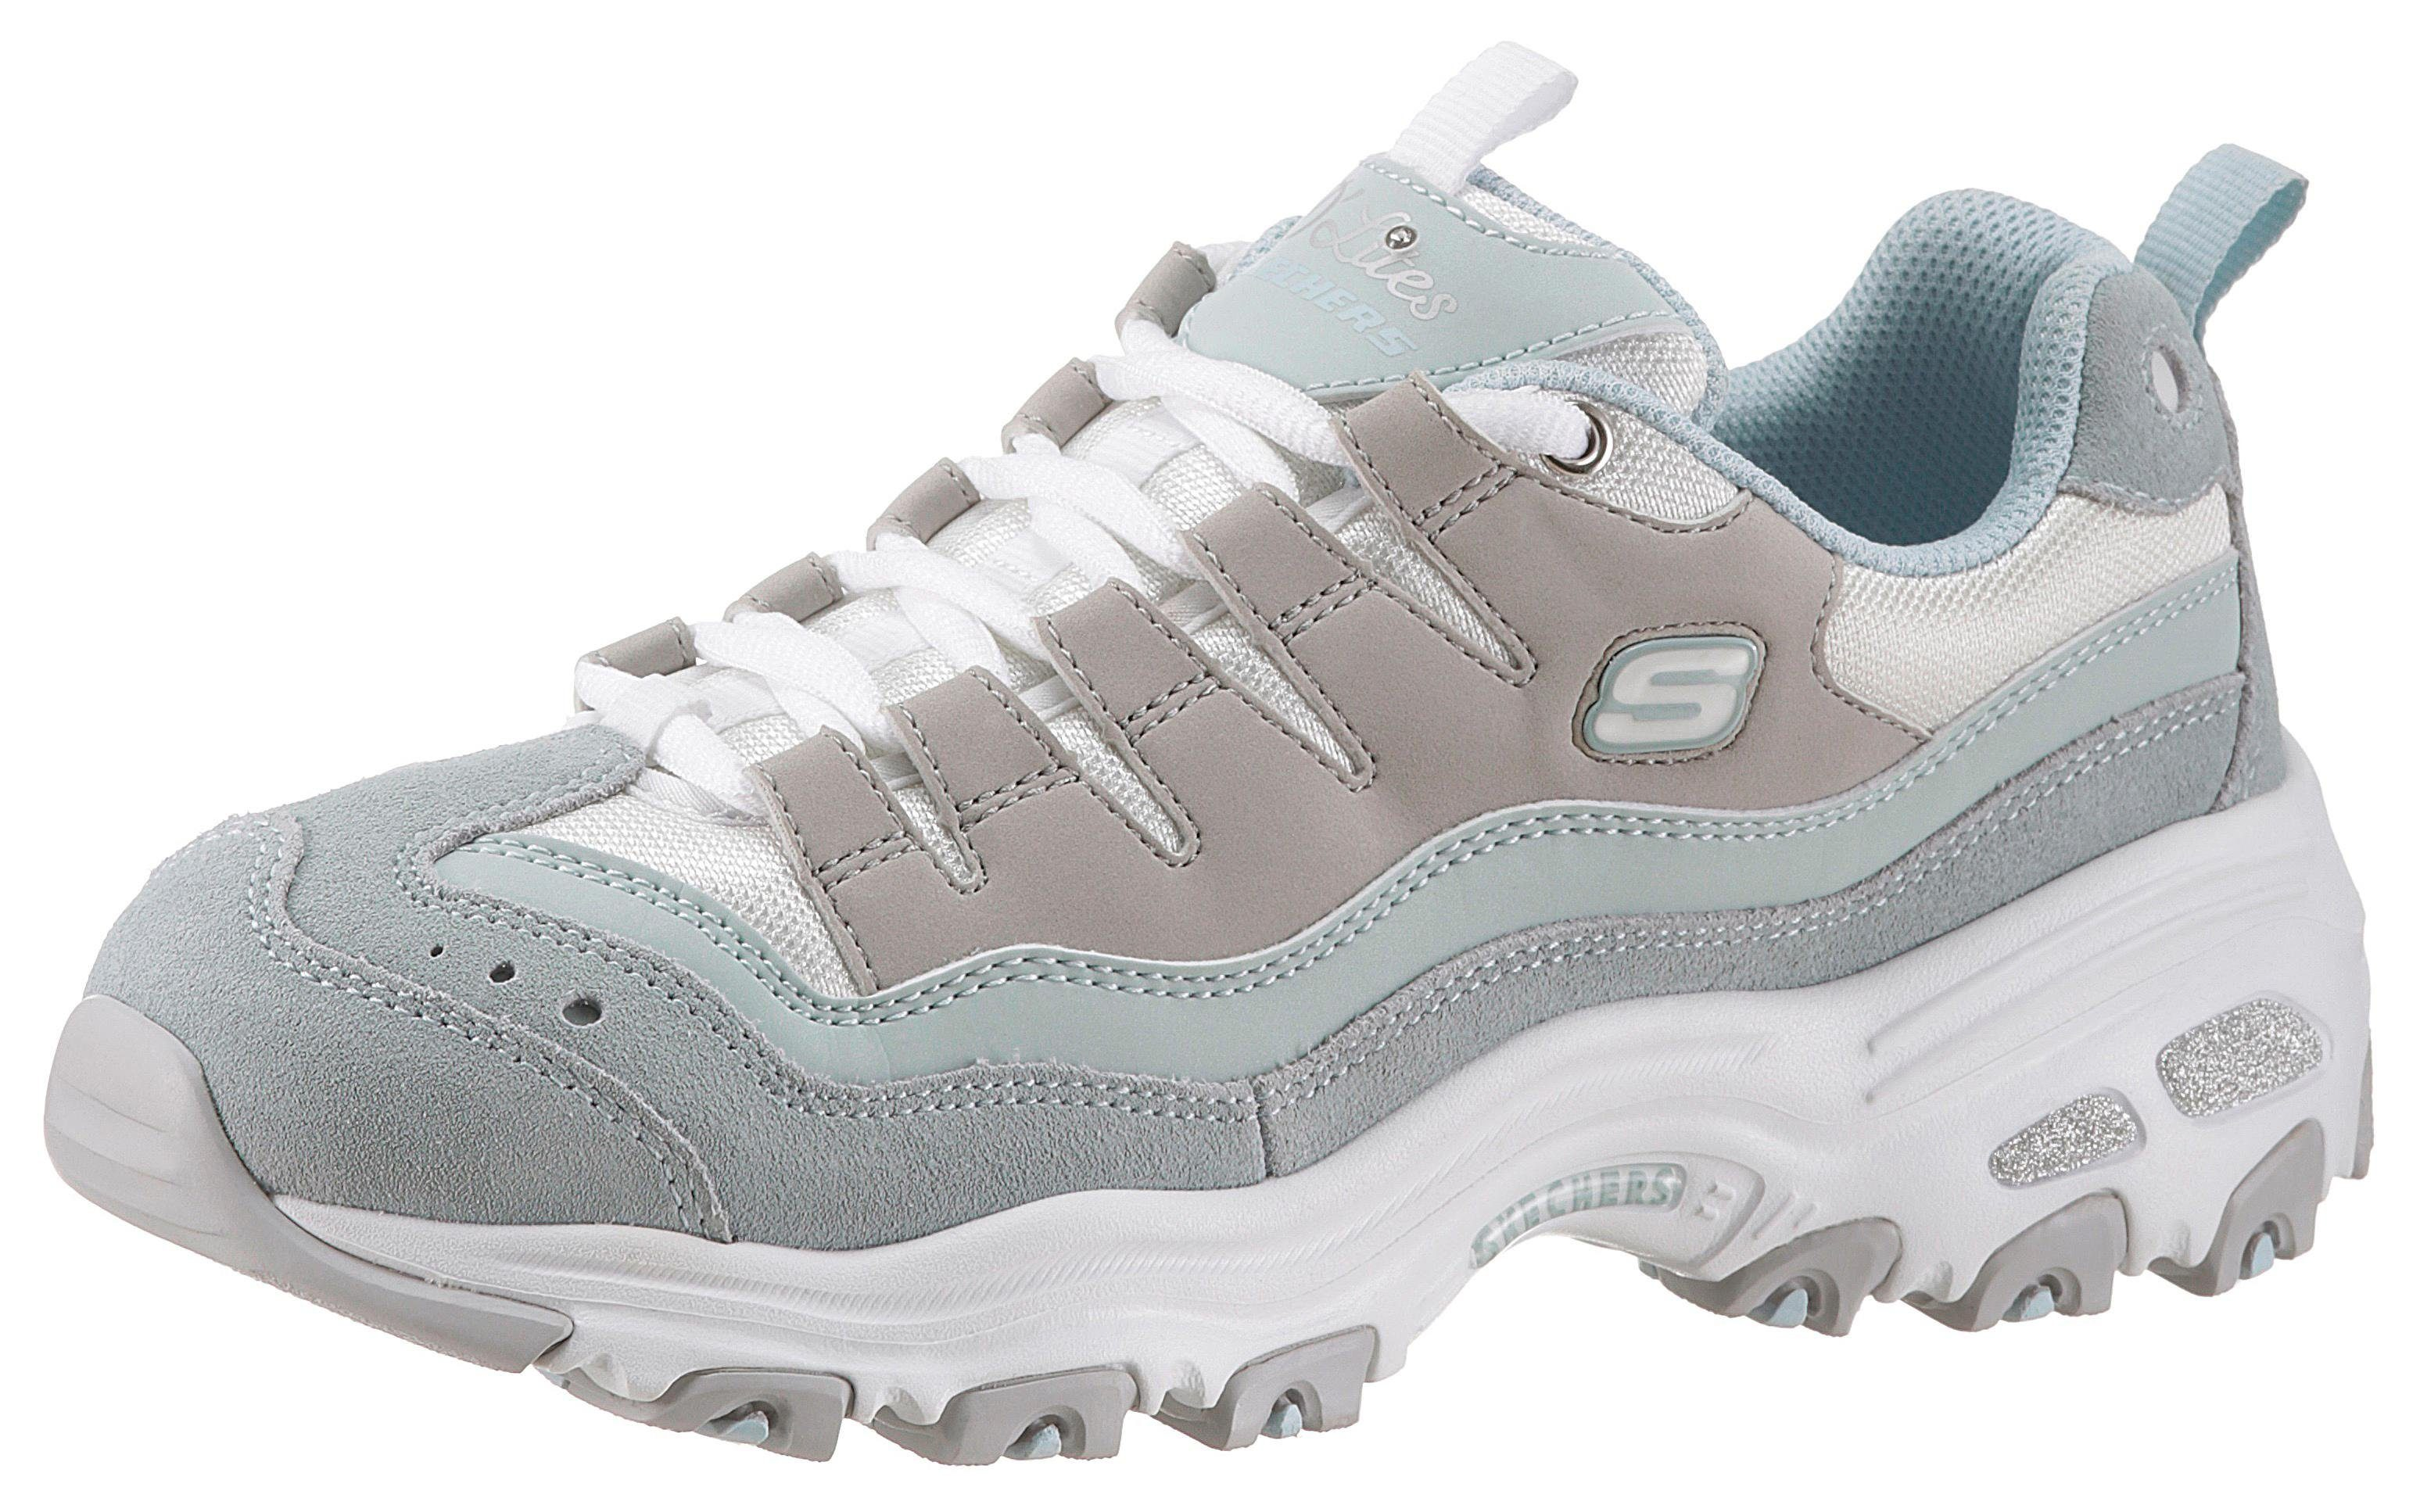 Skechers »D´Lites Sure Thing« Sneaker mit hochgezogener Zehenkappe online kaufen | OTTO